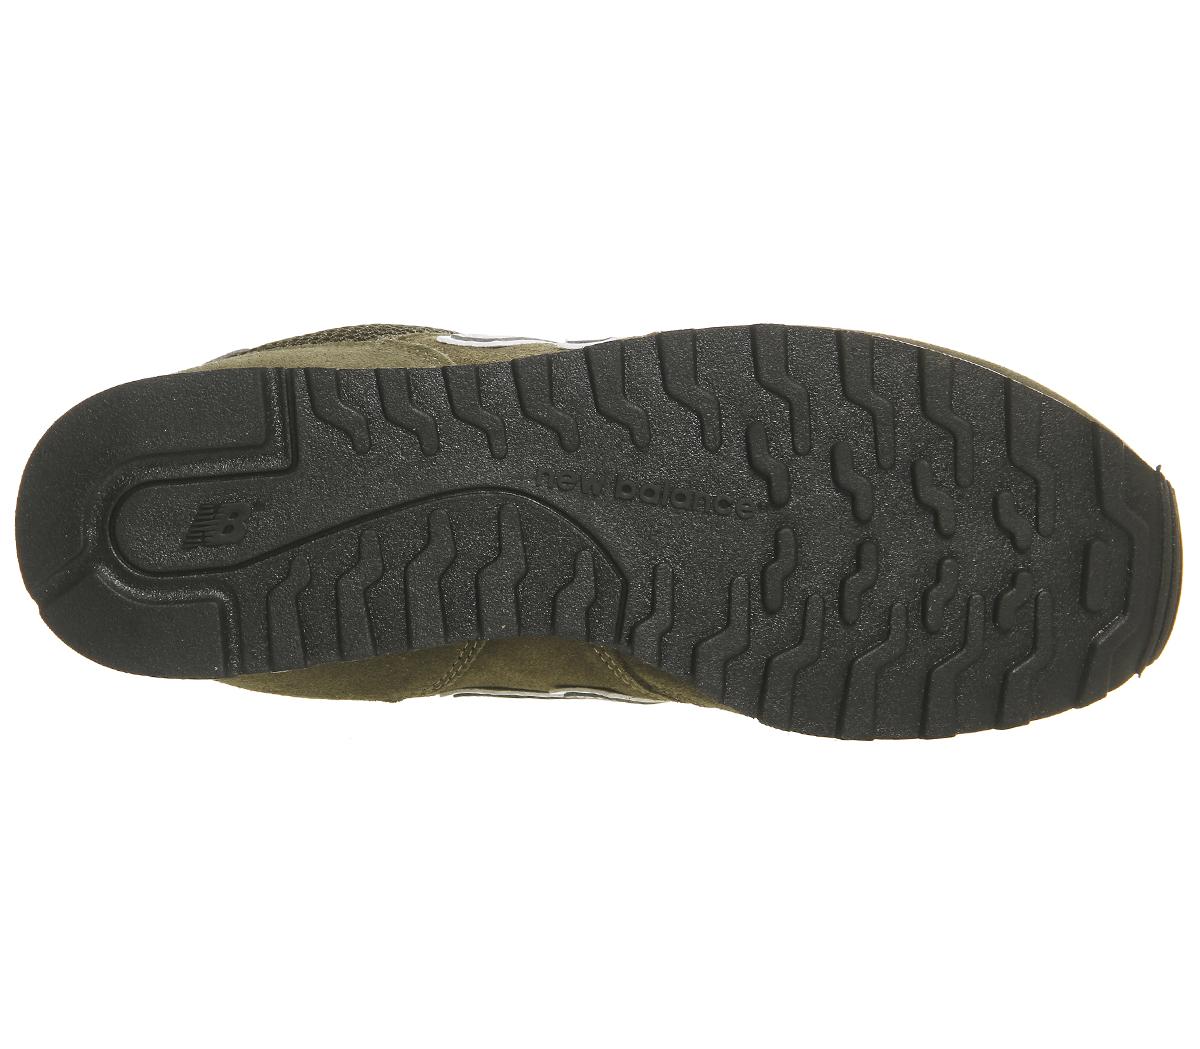 57f5d9d7f89 SENTINEL Mens nuovo equilibrio 373 oliva argento formatori scarpe